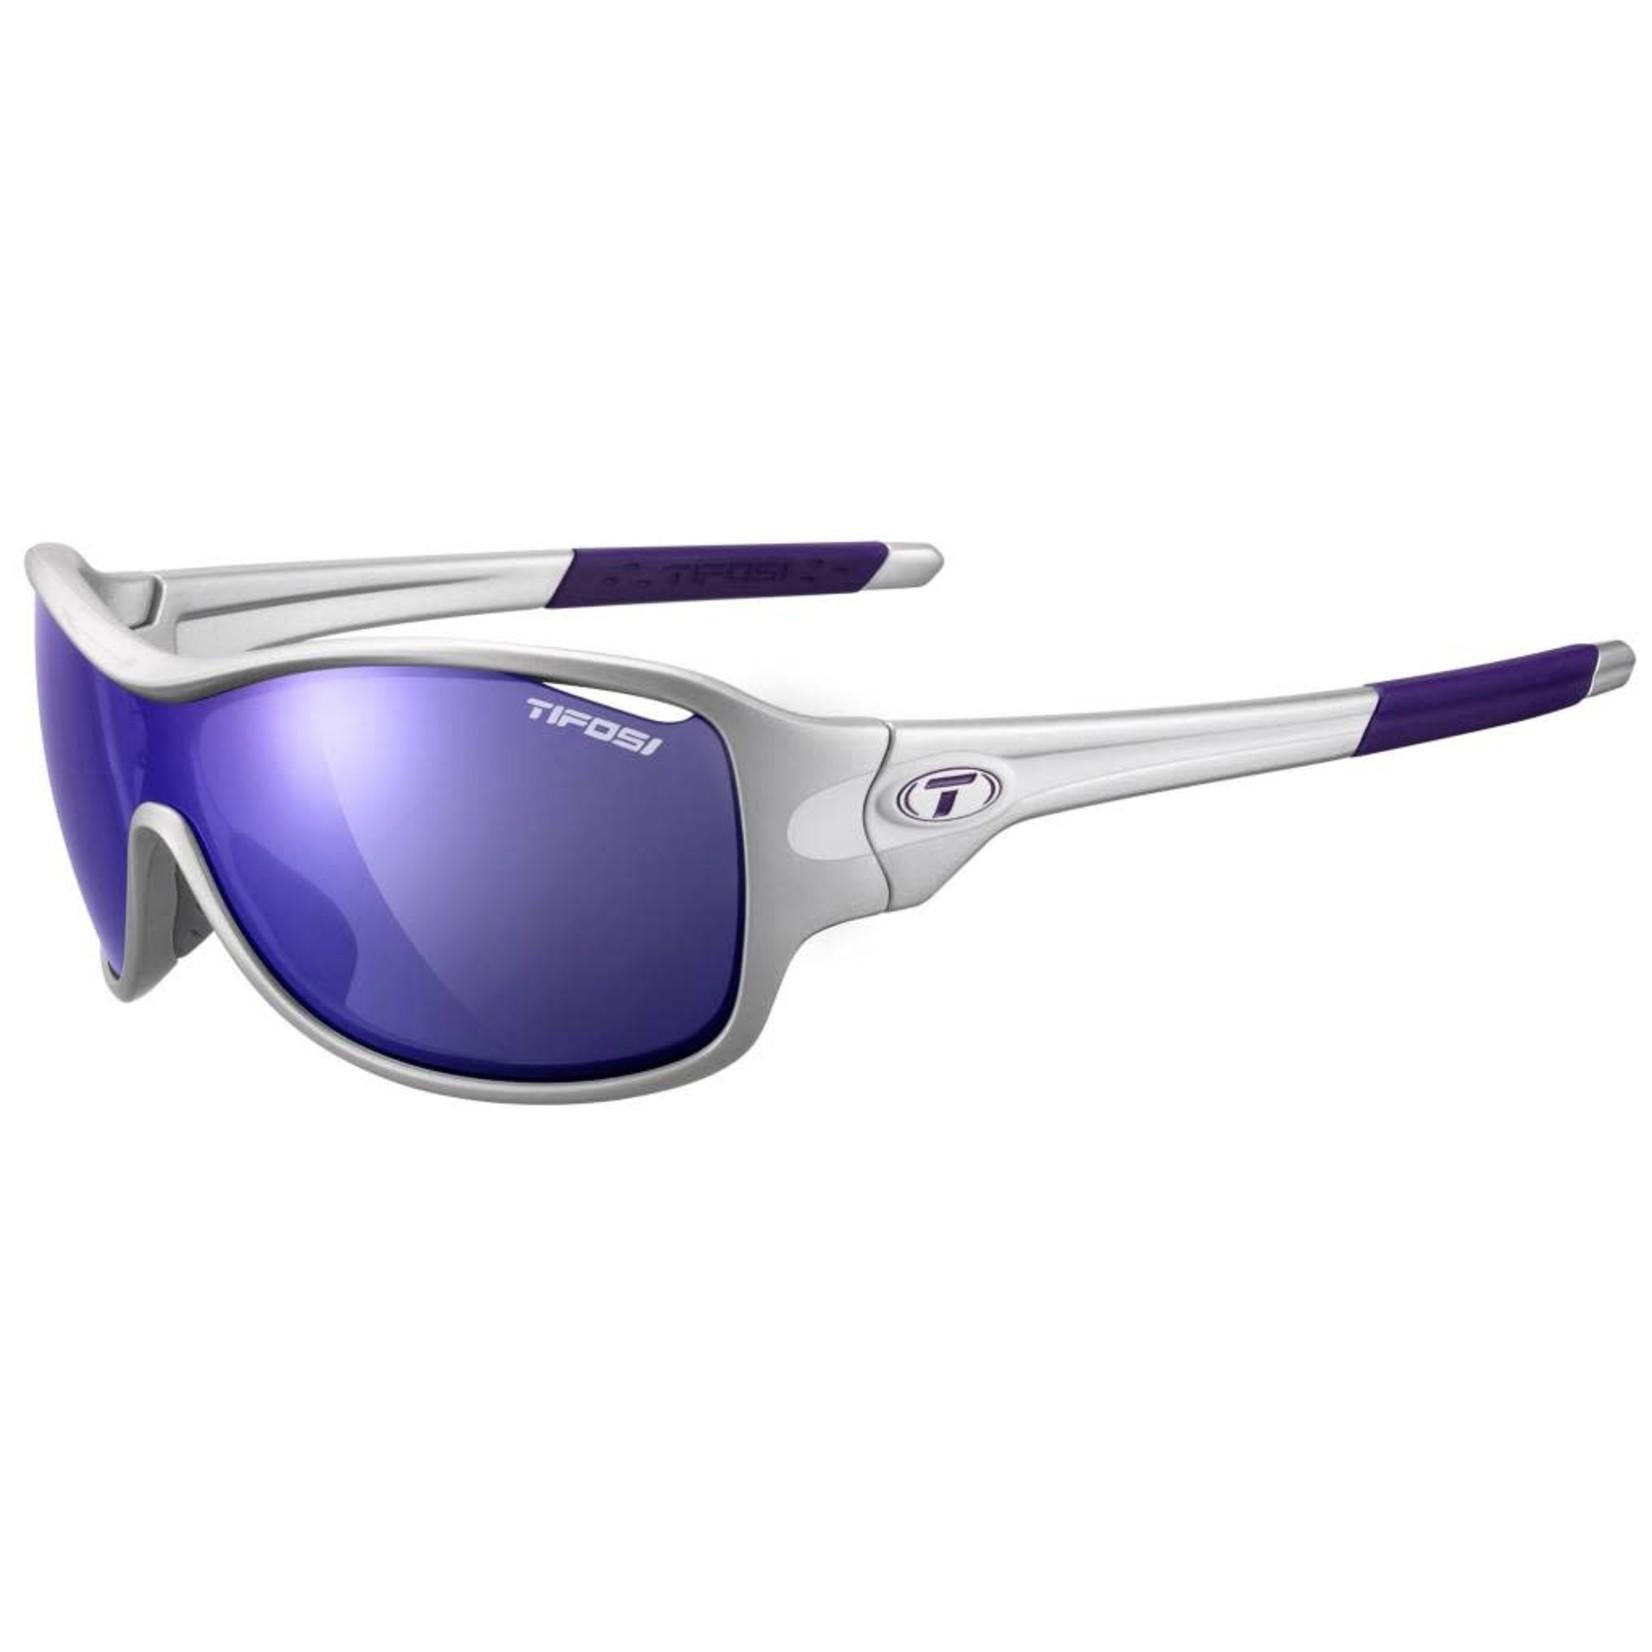 Tifosi Rumor Sunglasses Silver/Purple